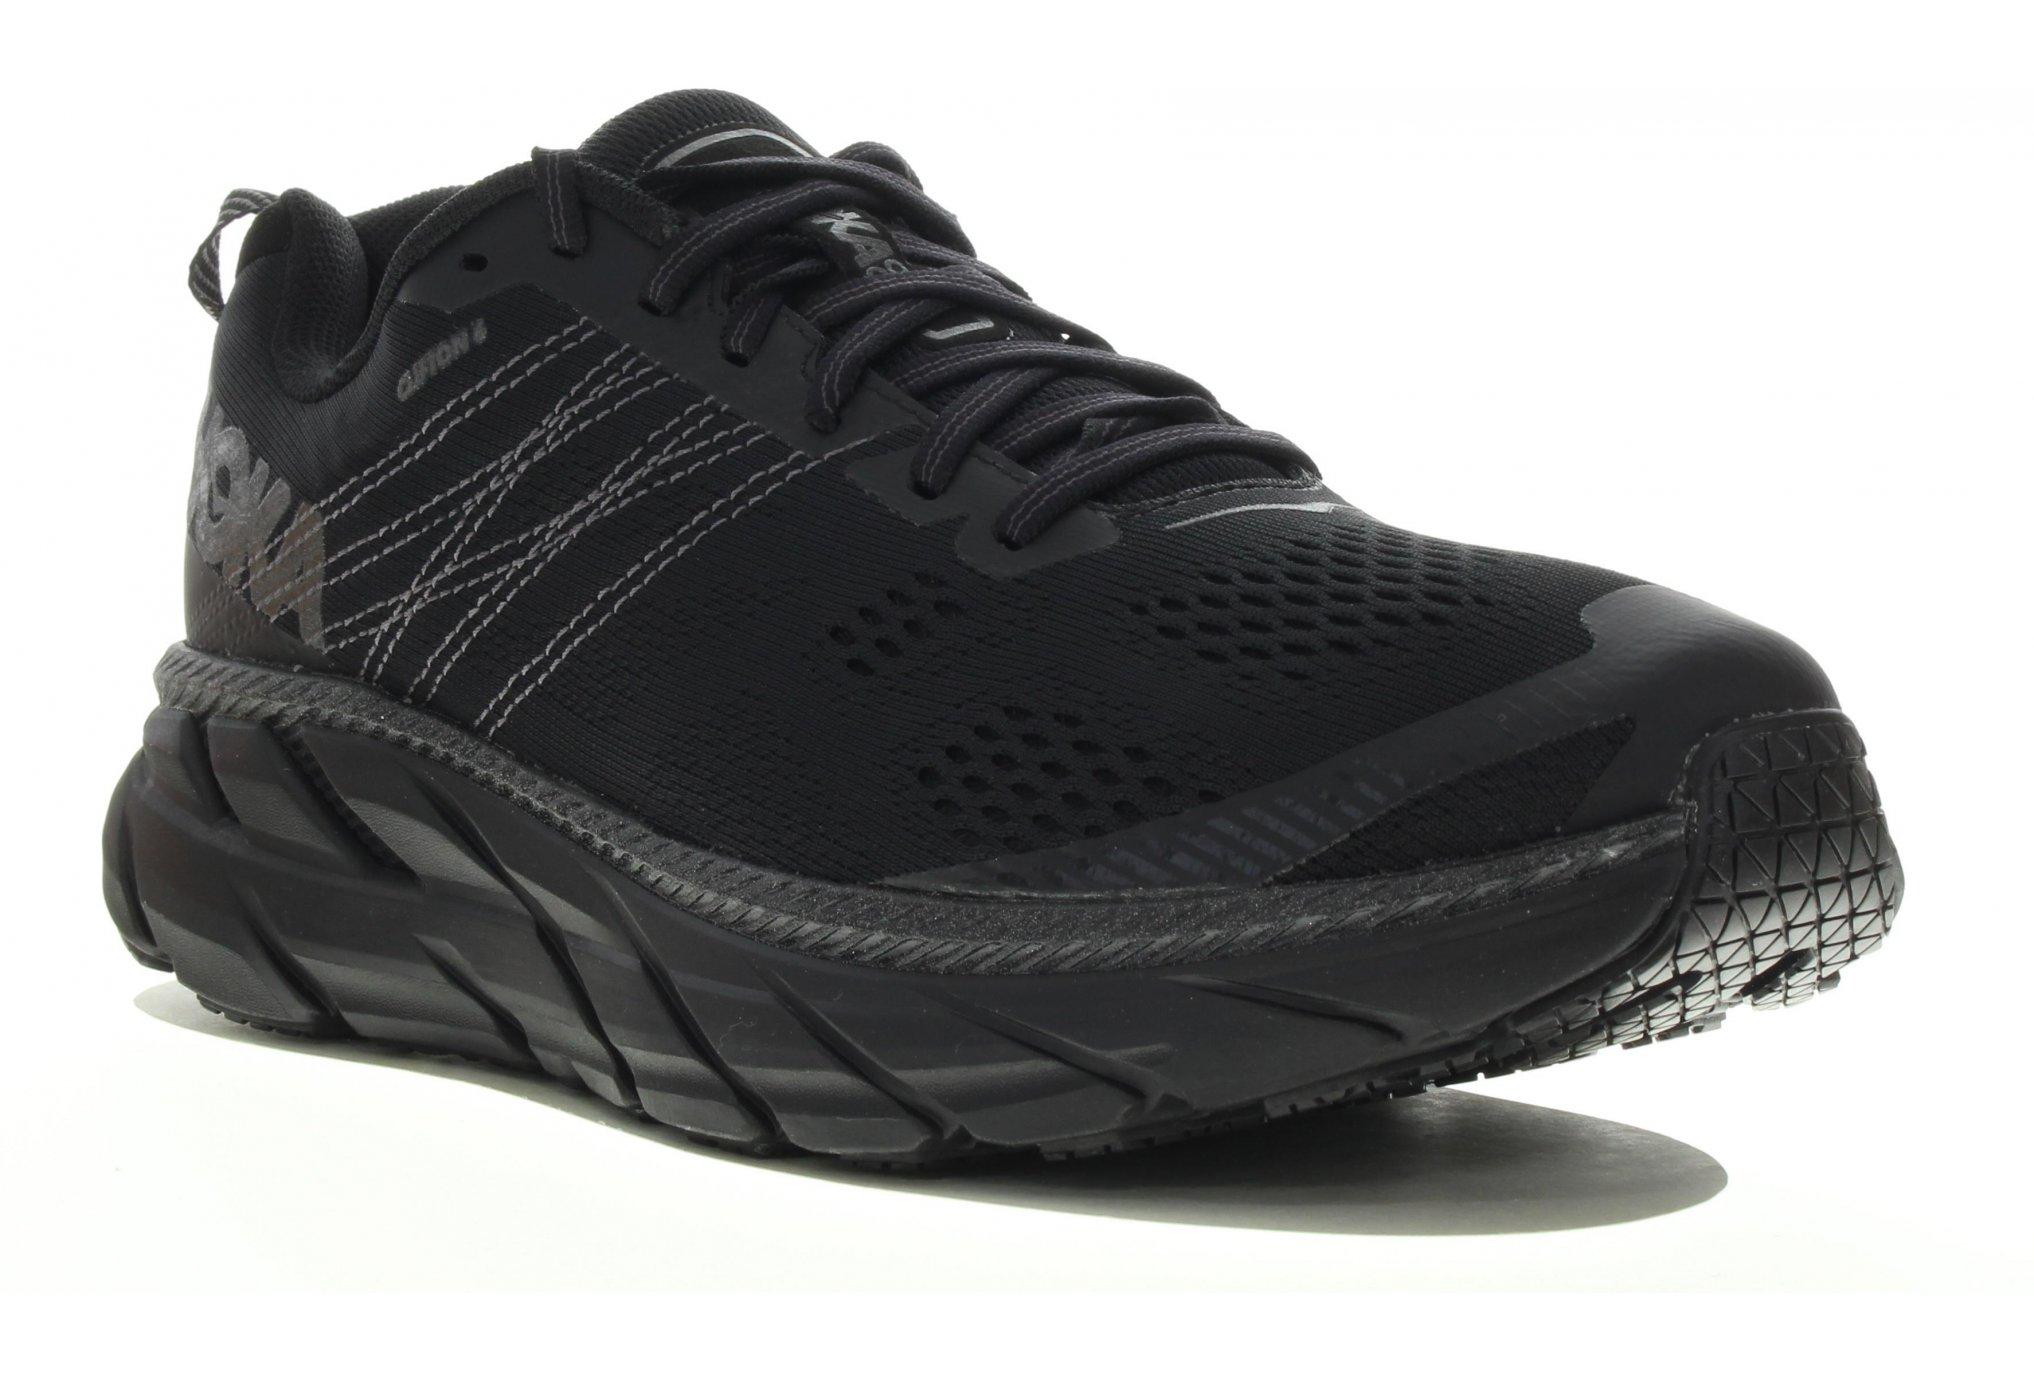 Hoka One One Clifton 6 M Diététique Chaussures homme